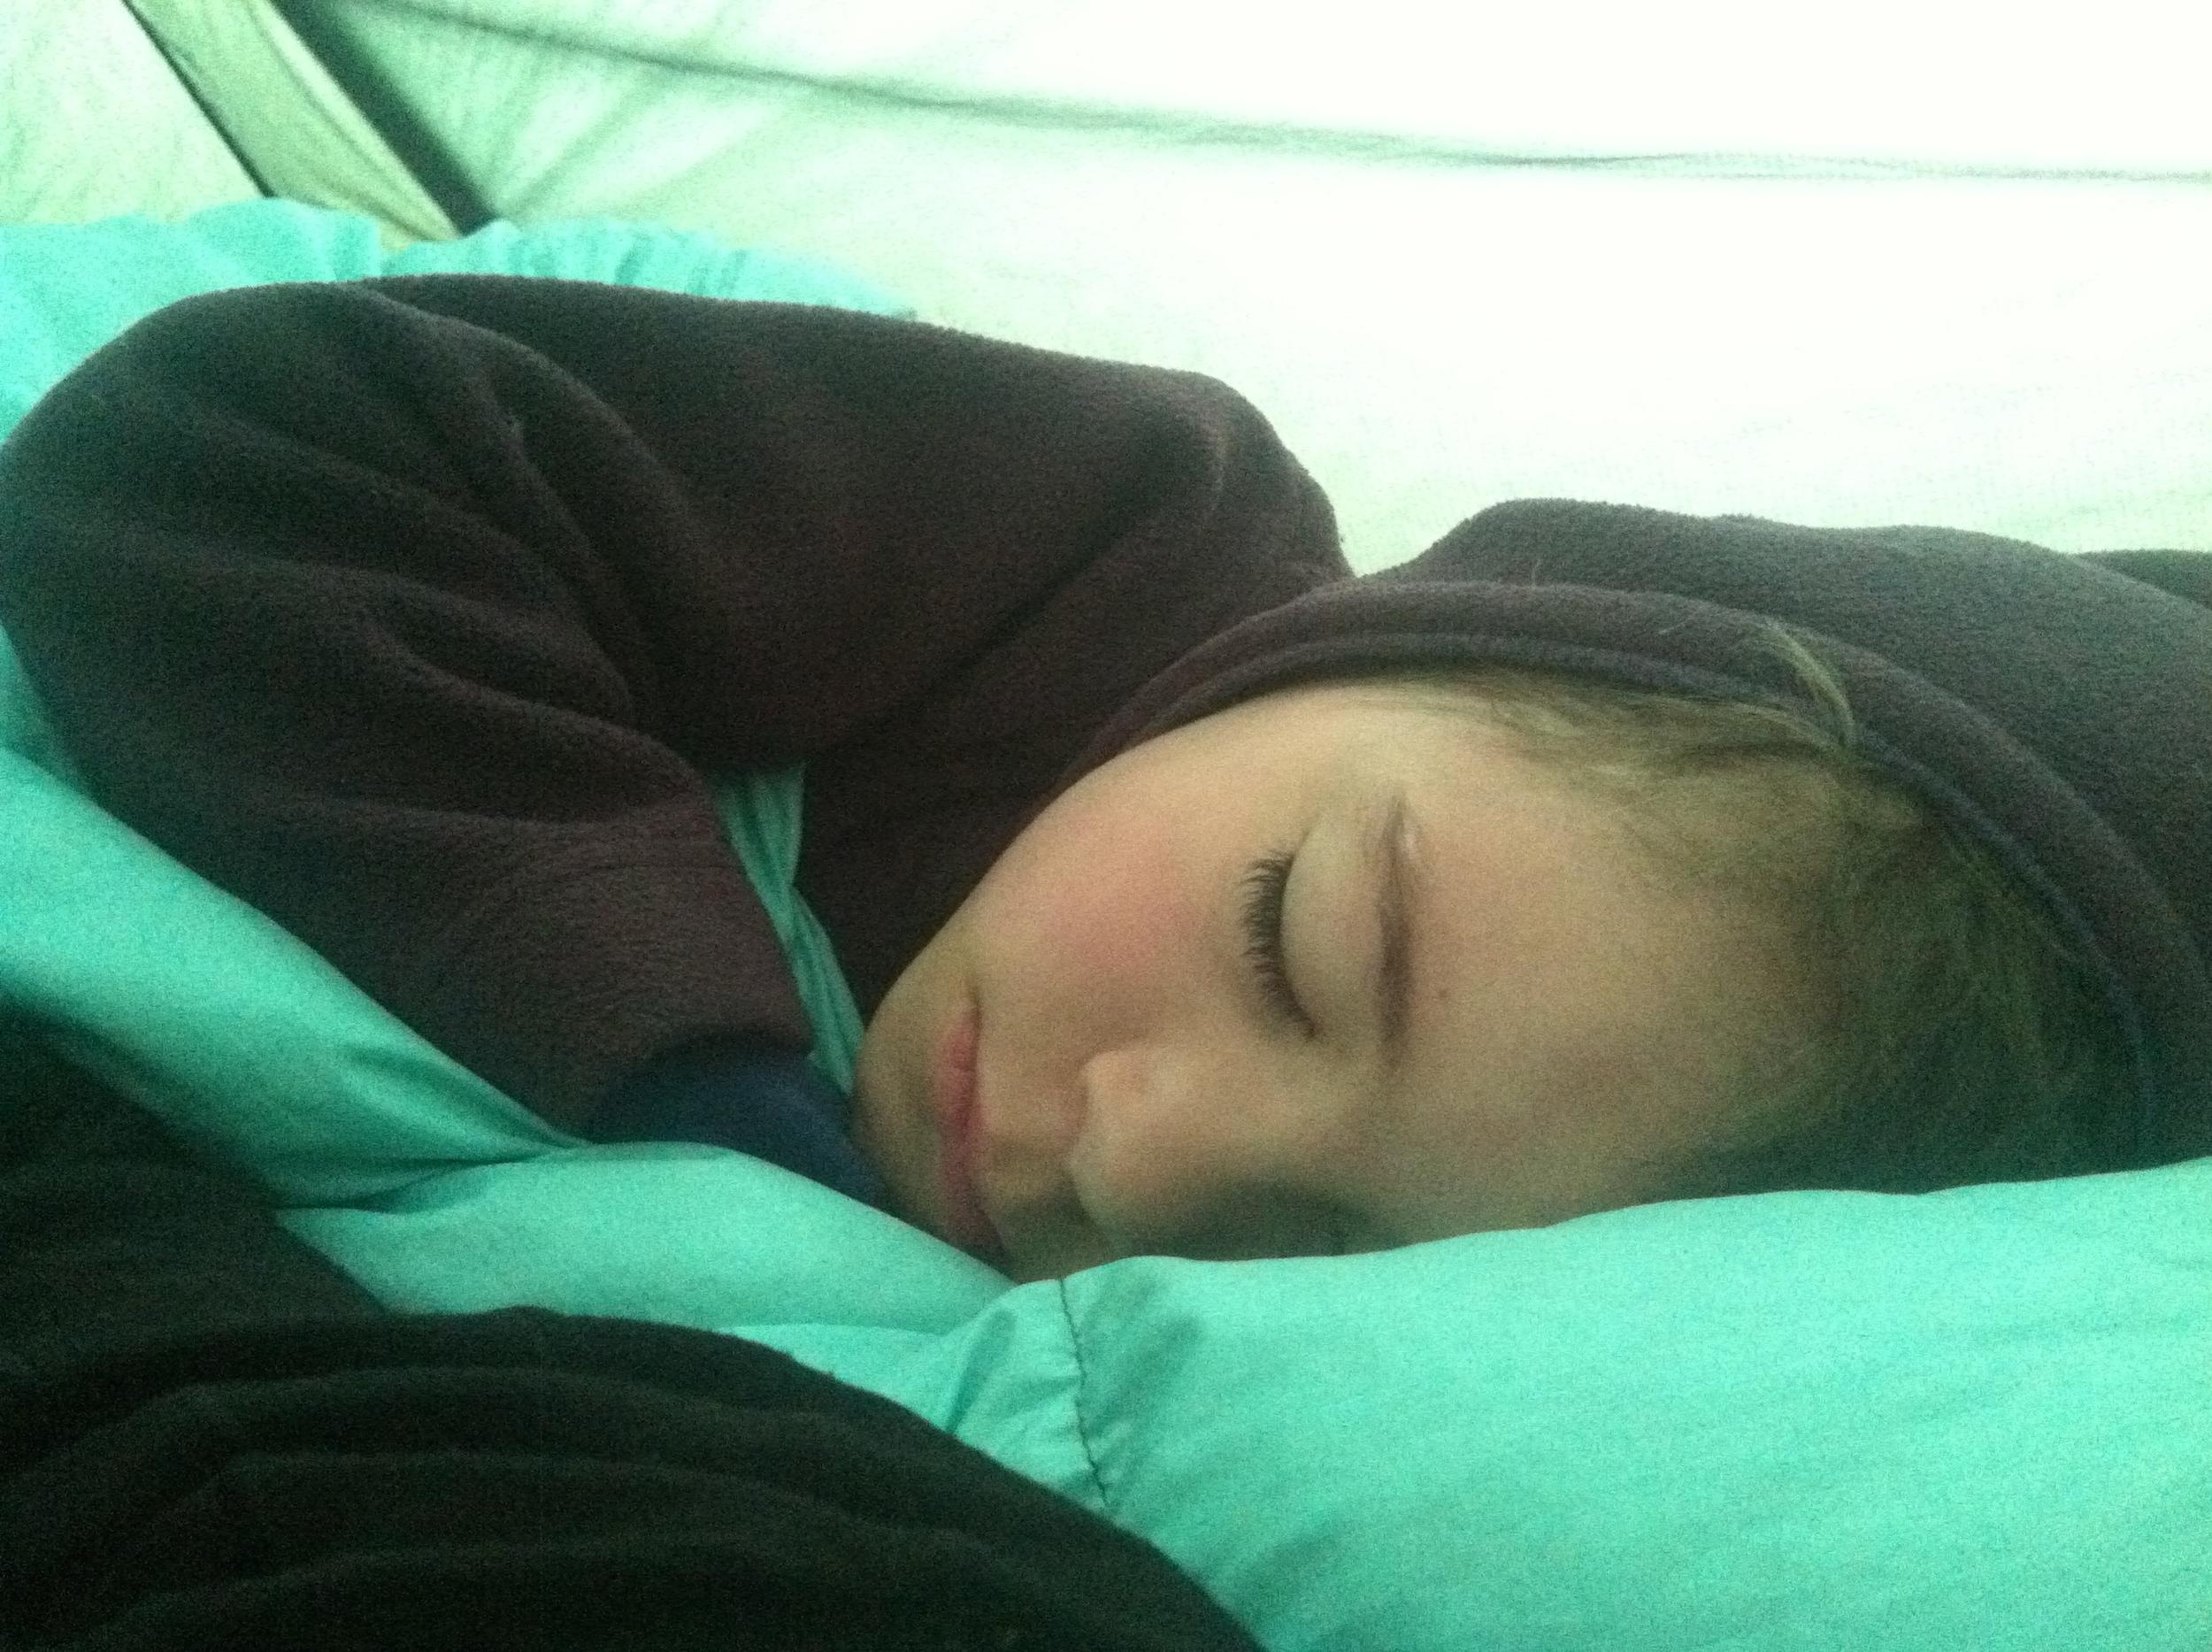 Last morning sleepytown kiddo.